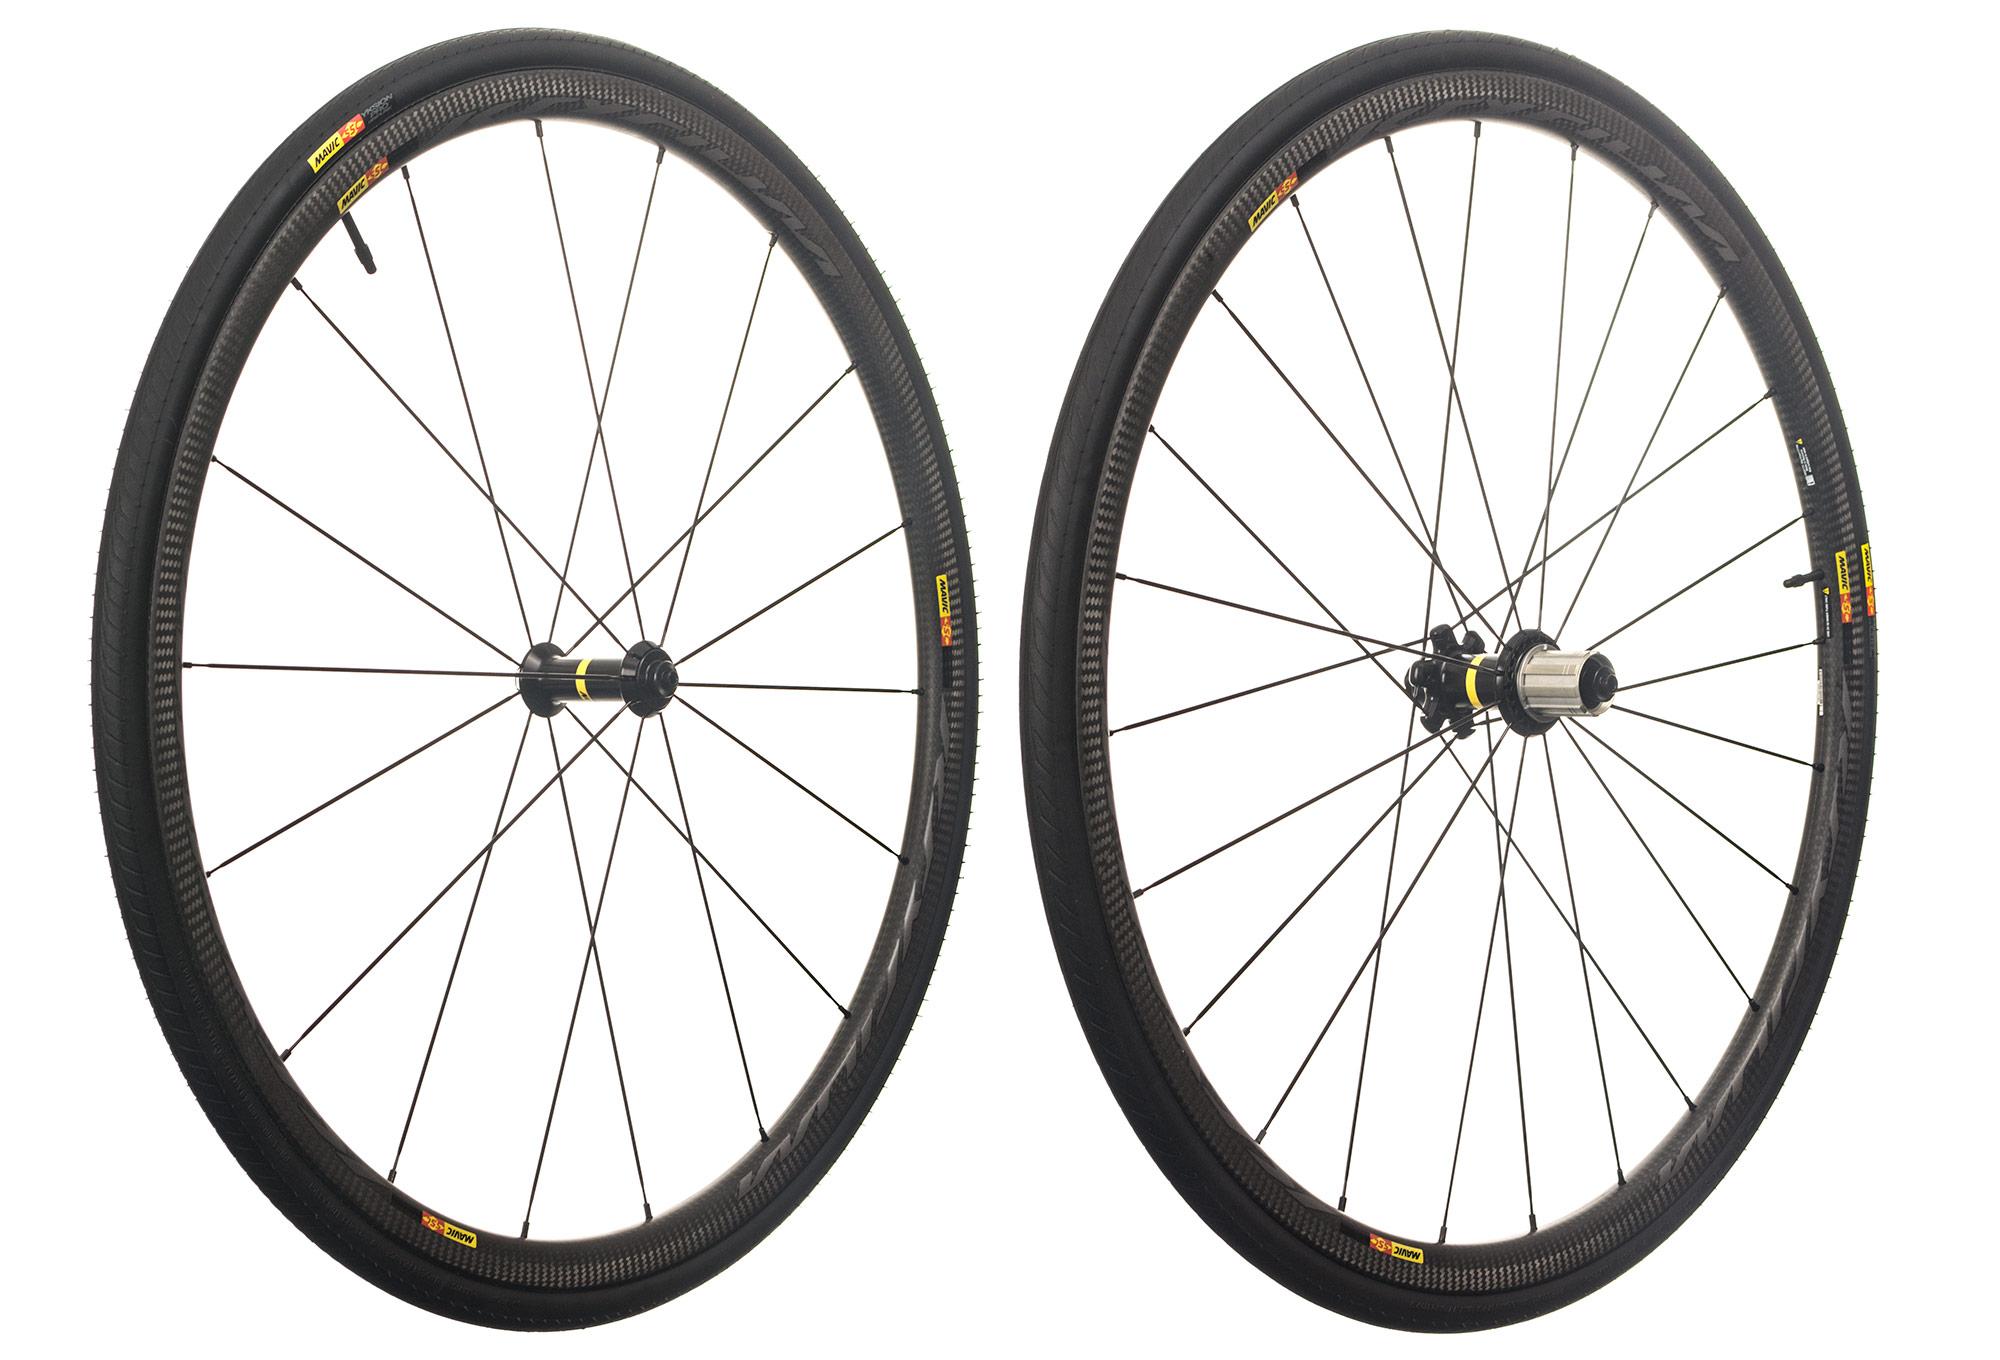 best loved best wholesaler new products Wheelset MAVIC 2018 Ksyrium Pro Carbon SL Clincher - Yksion Pro 25mm